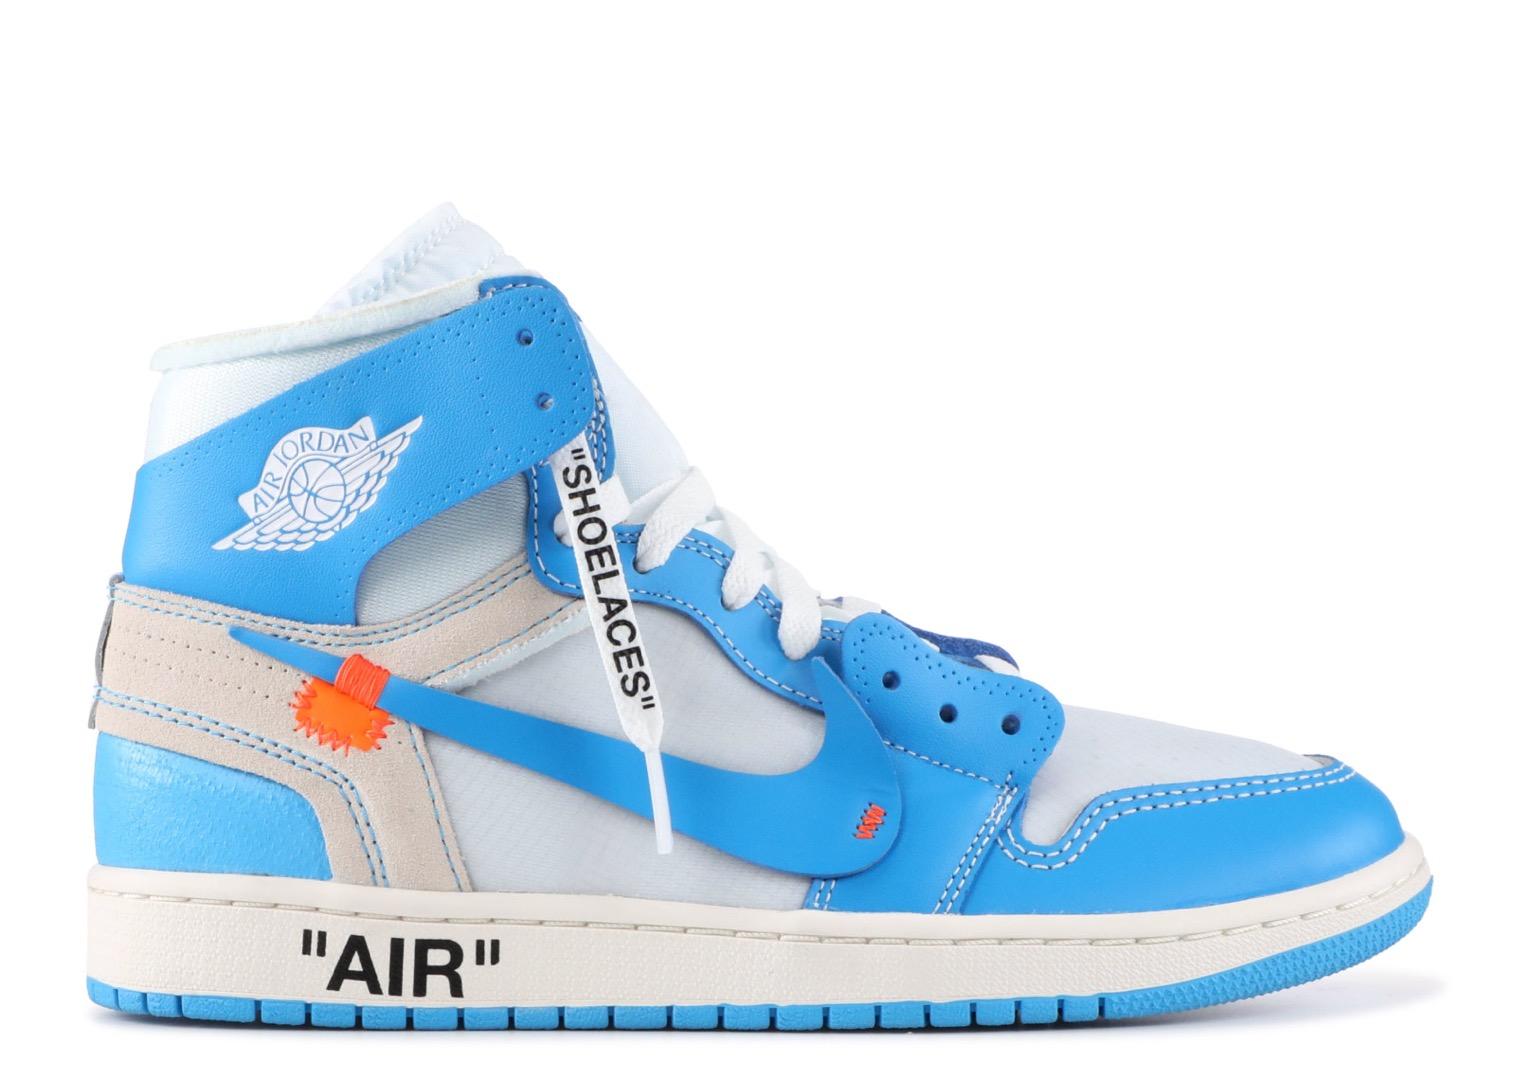 Air Jordan OFF WHITE NRG OFF